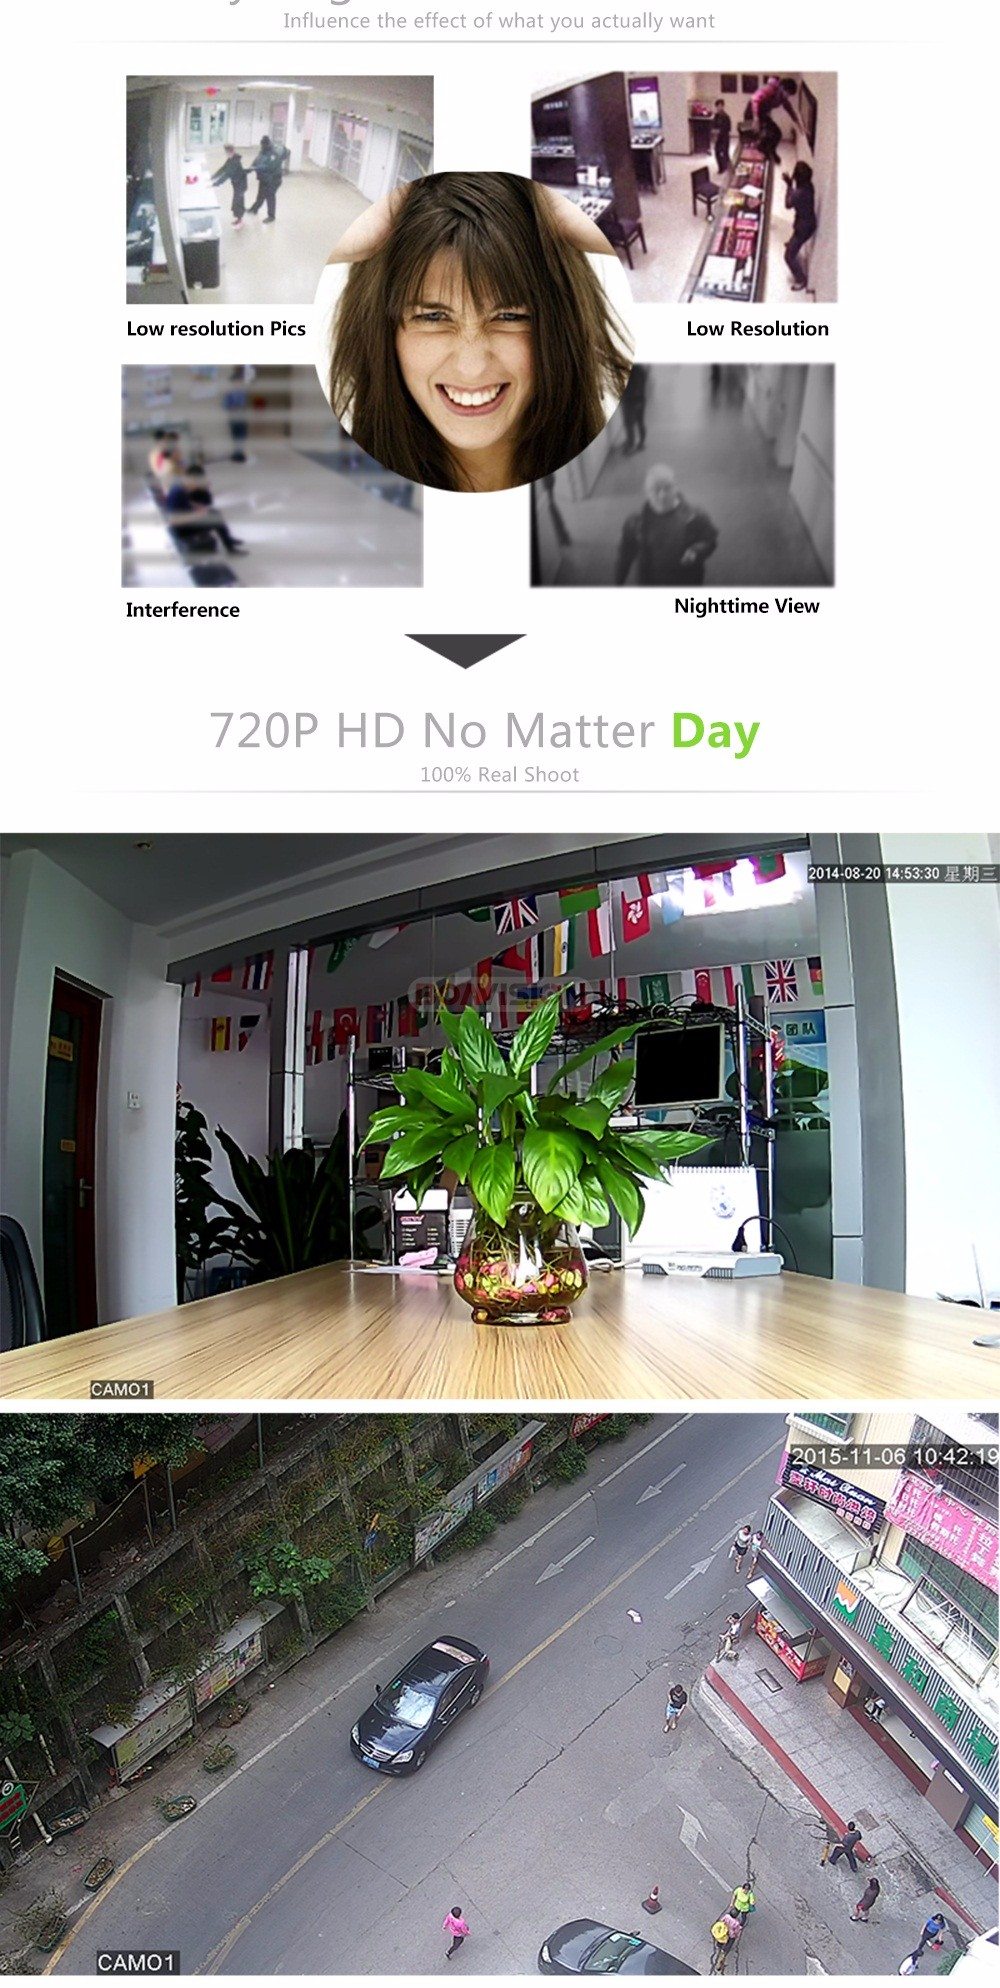 05 IP Camera